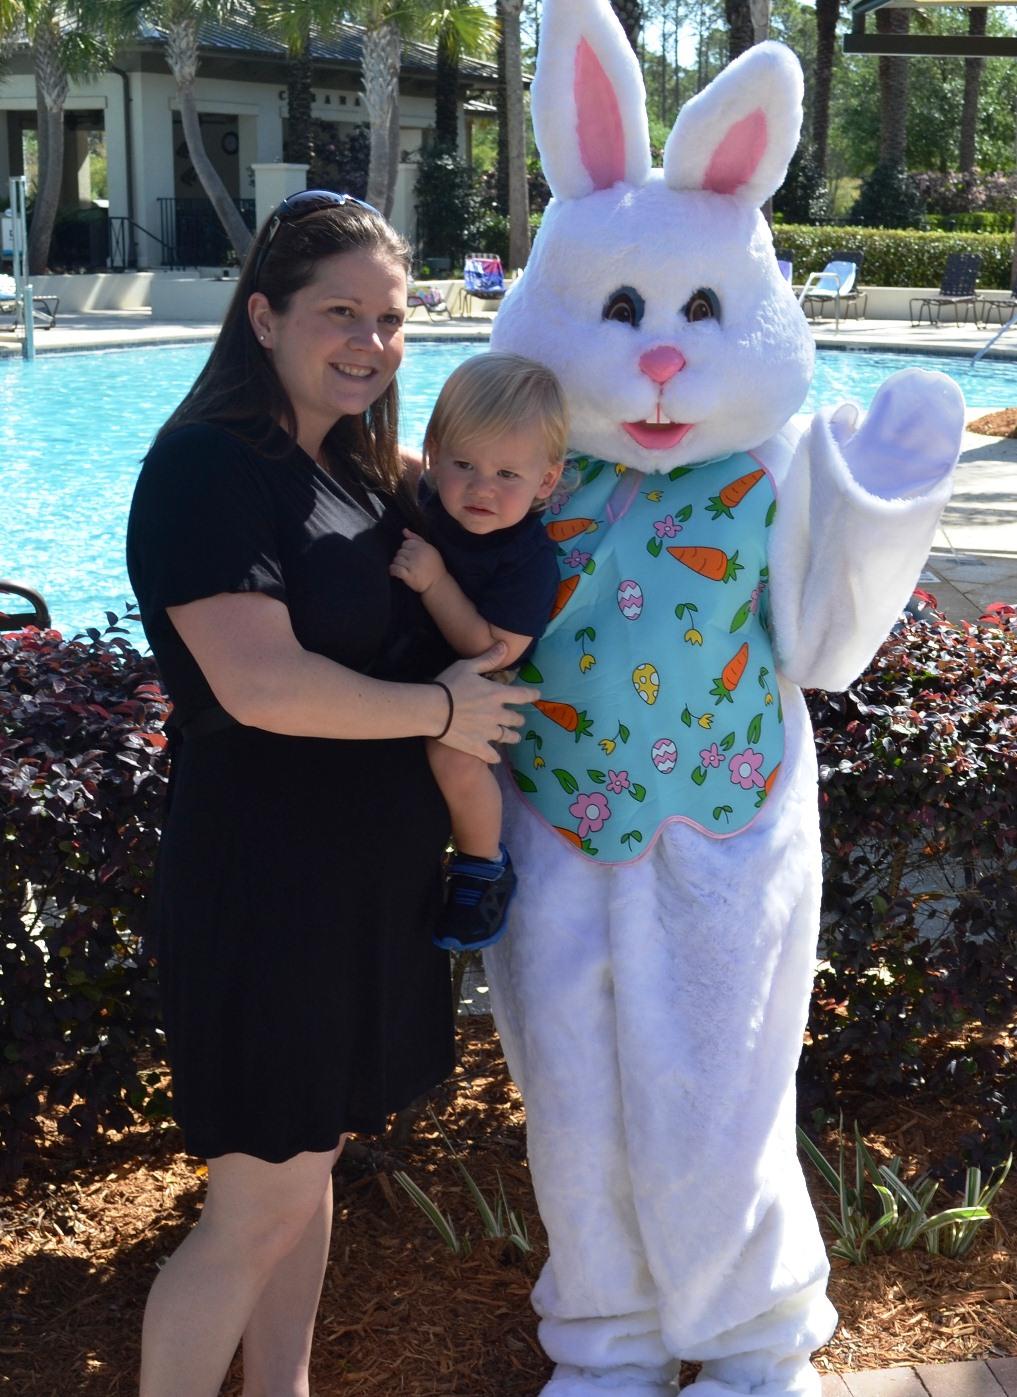 Easter Bunny at Splash Water Park